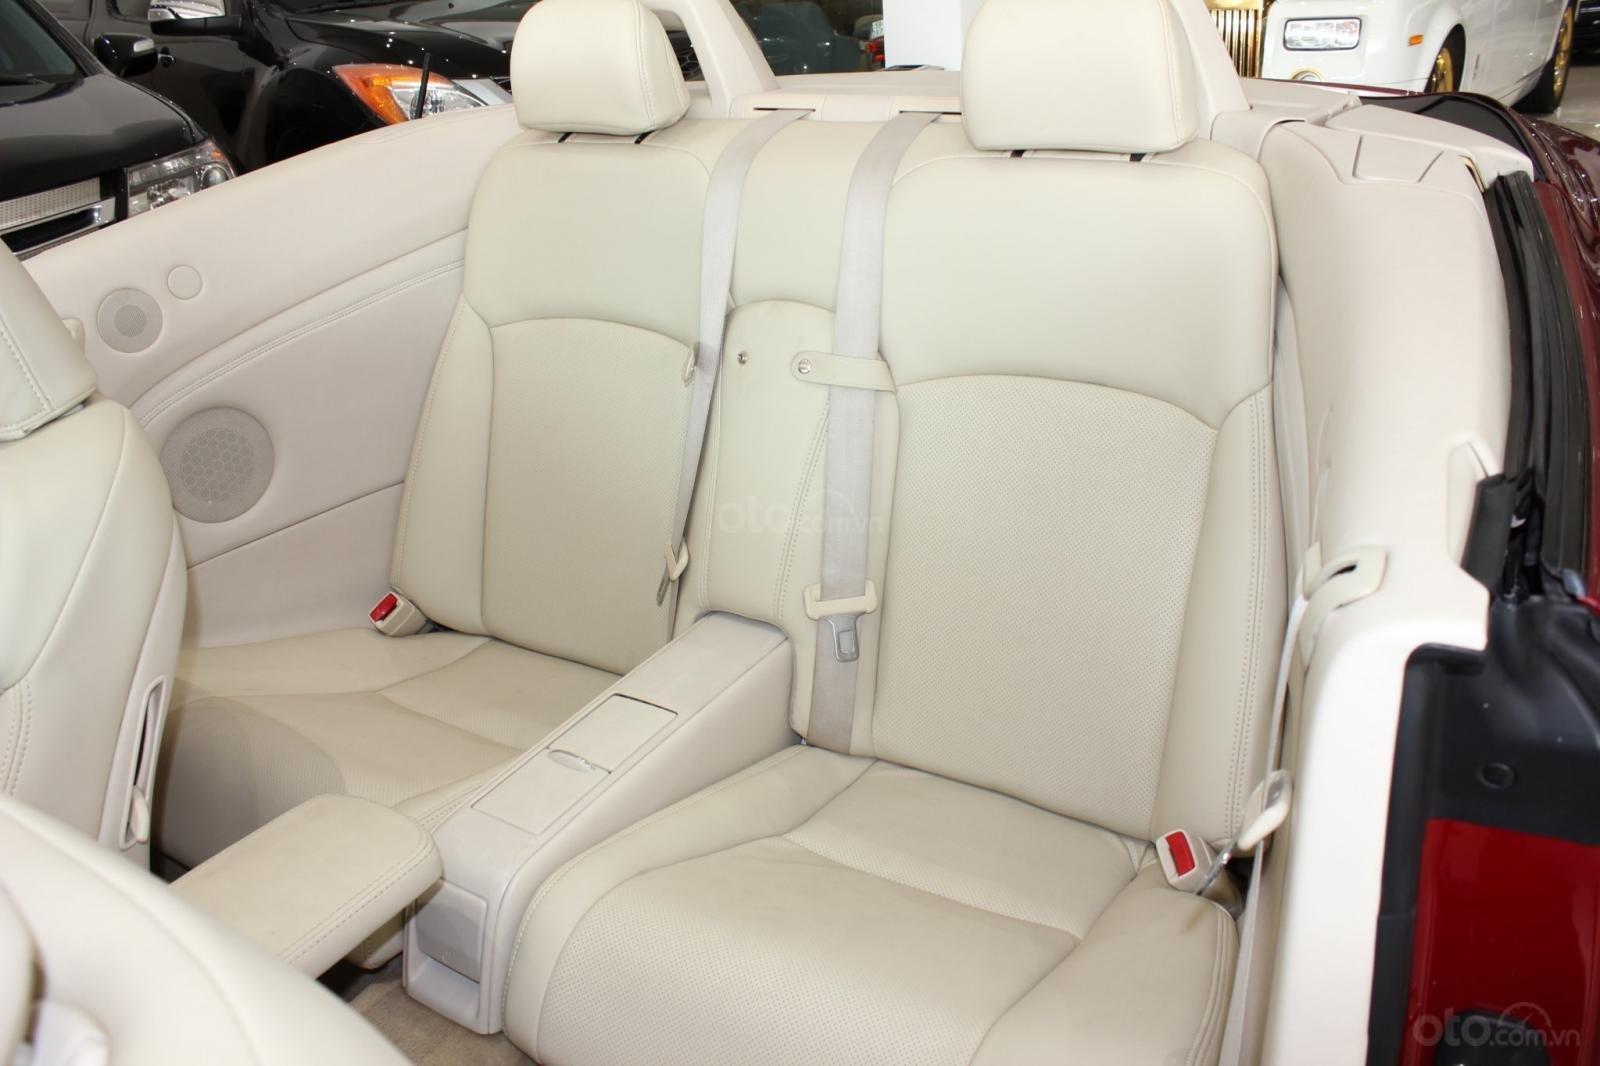 Bán Lexus IS 250 sx 2010, màu đỏ, xe nhập (18)